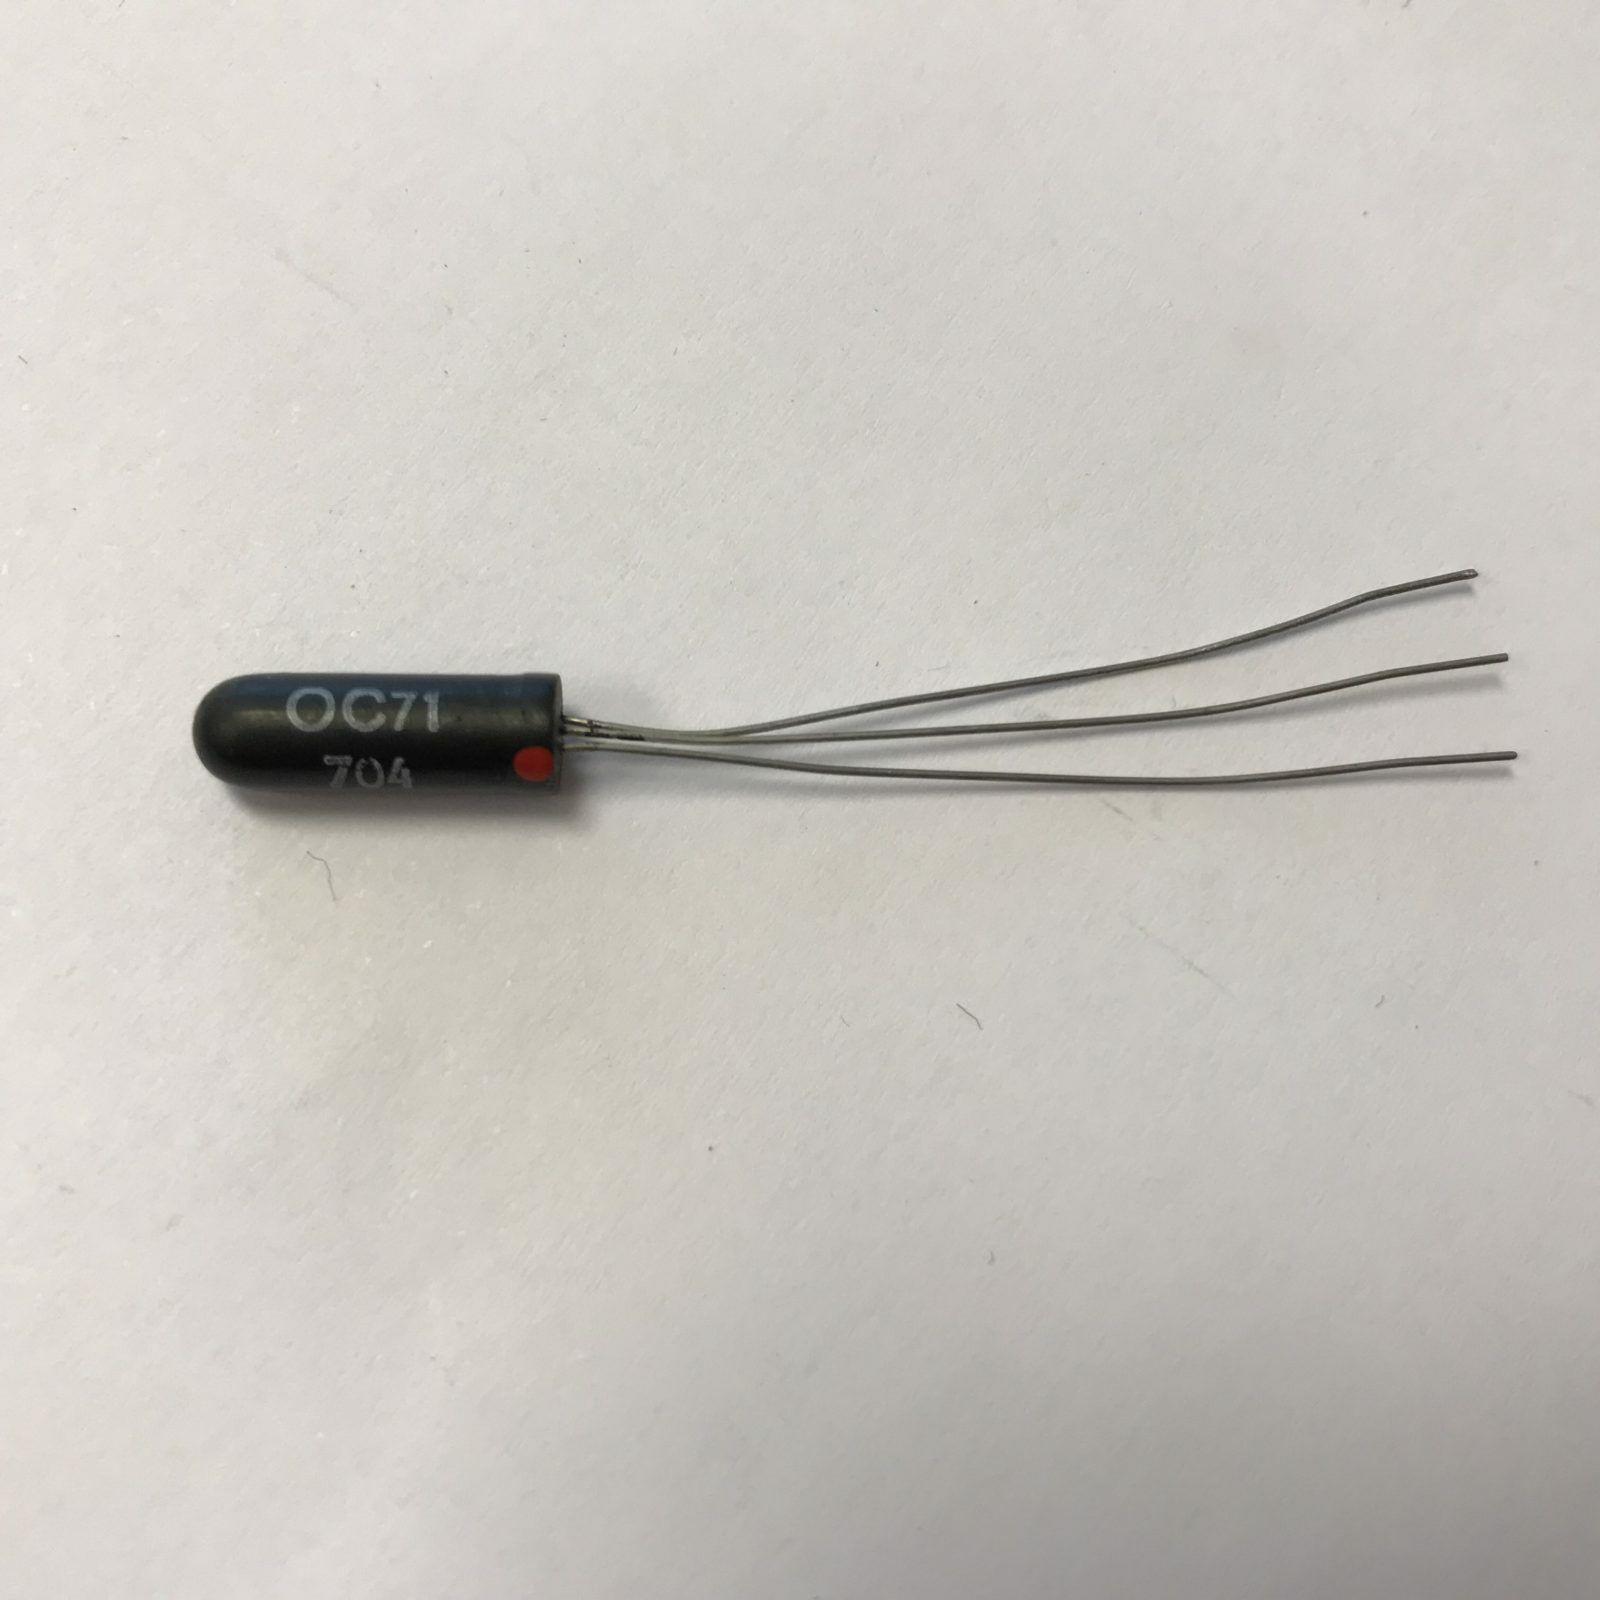 OC71 Germanium Transistor Hfe = 57 Iceo = 380uA Tested